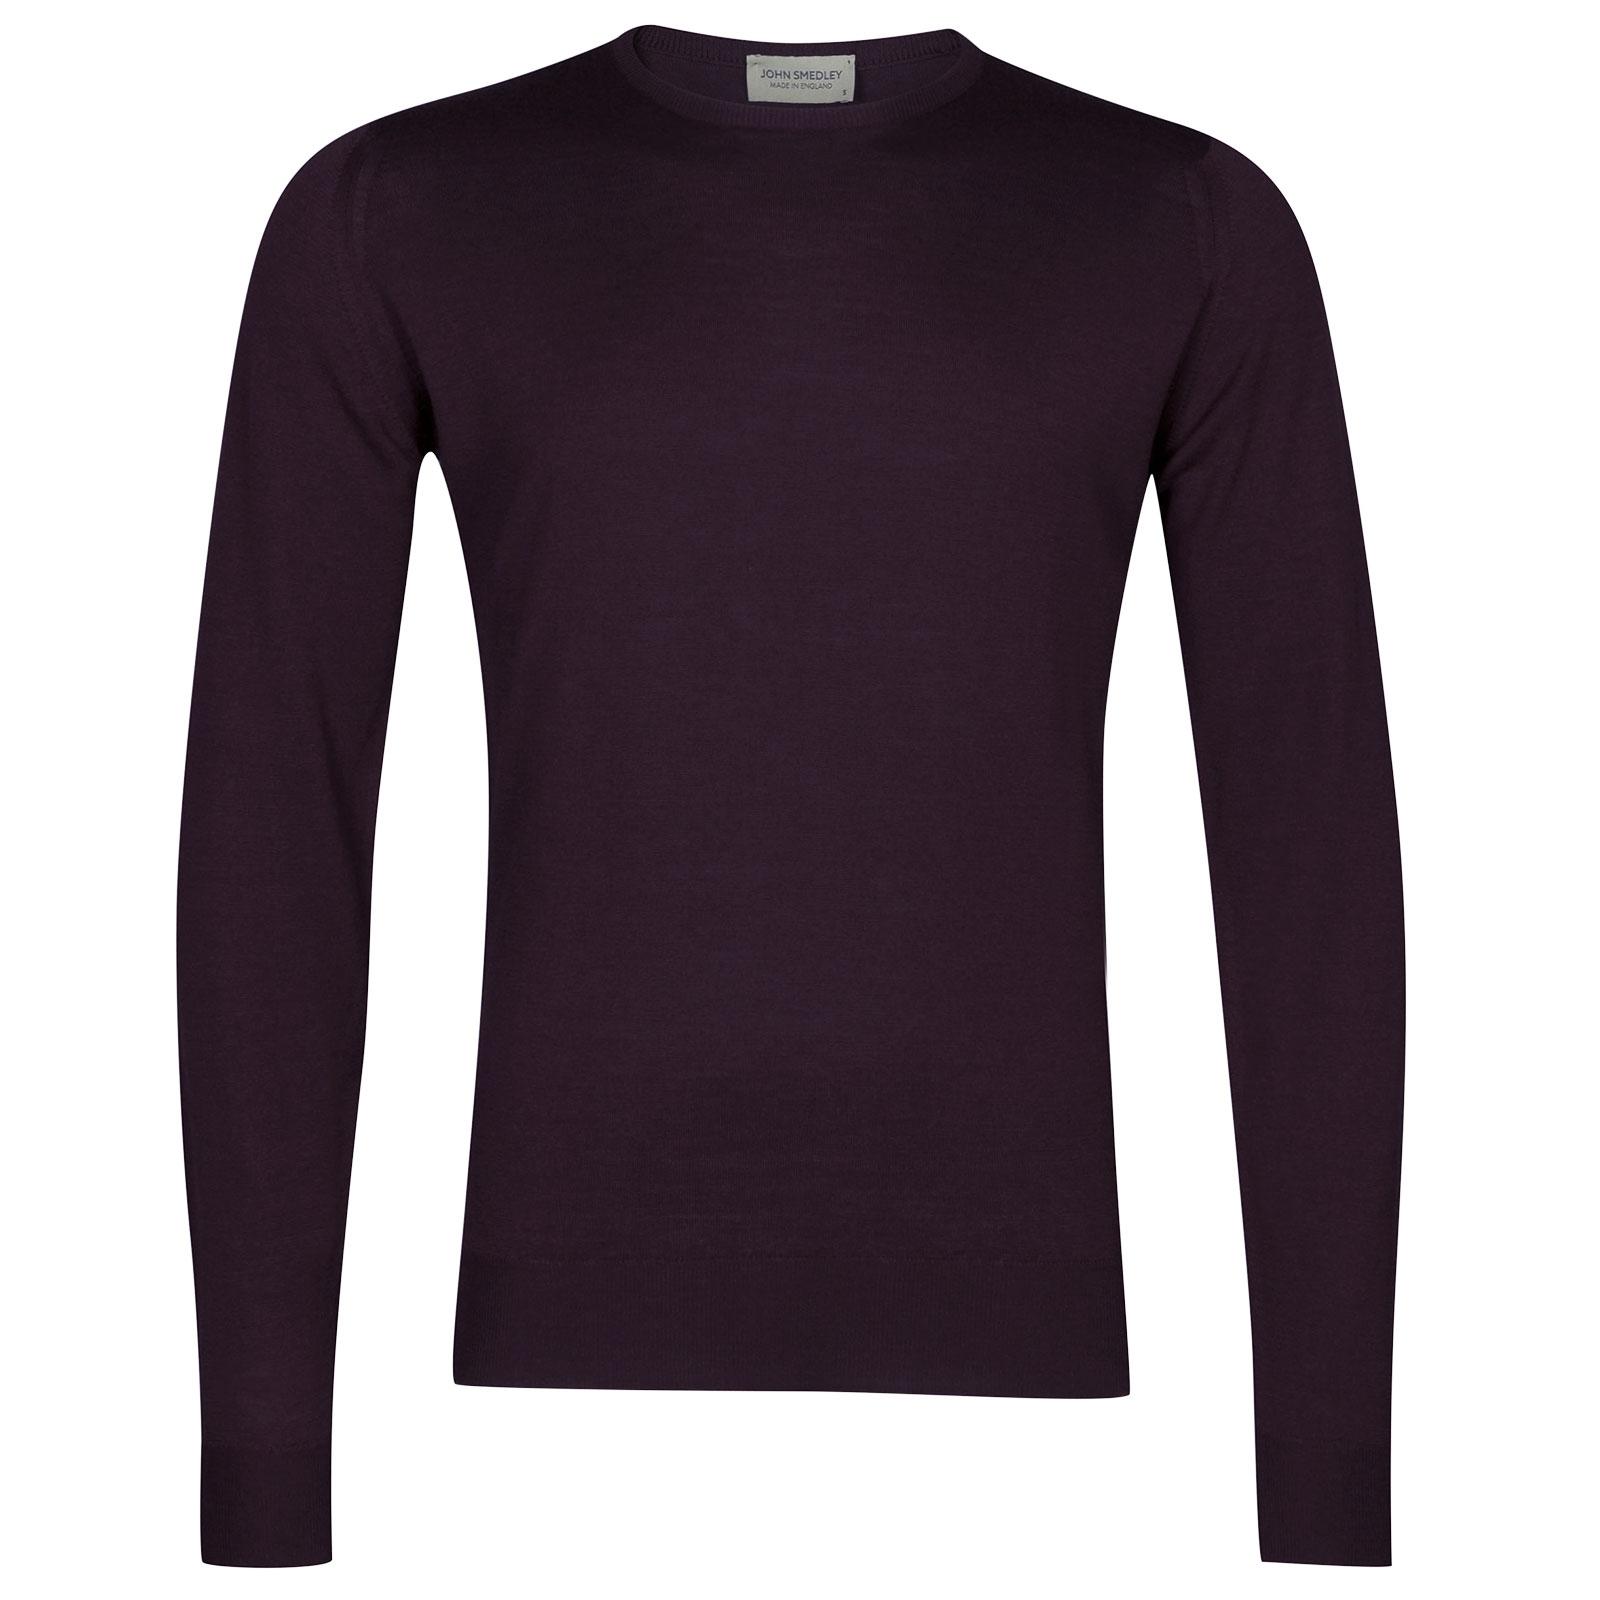 John Smedley Lundy Merino Wool Pullover in Mystic Purple-S